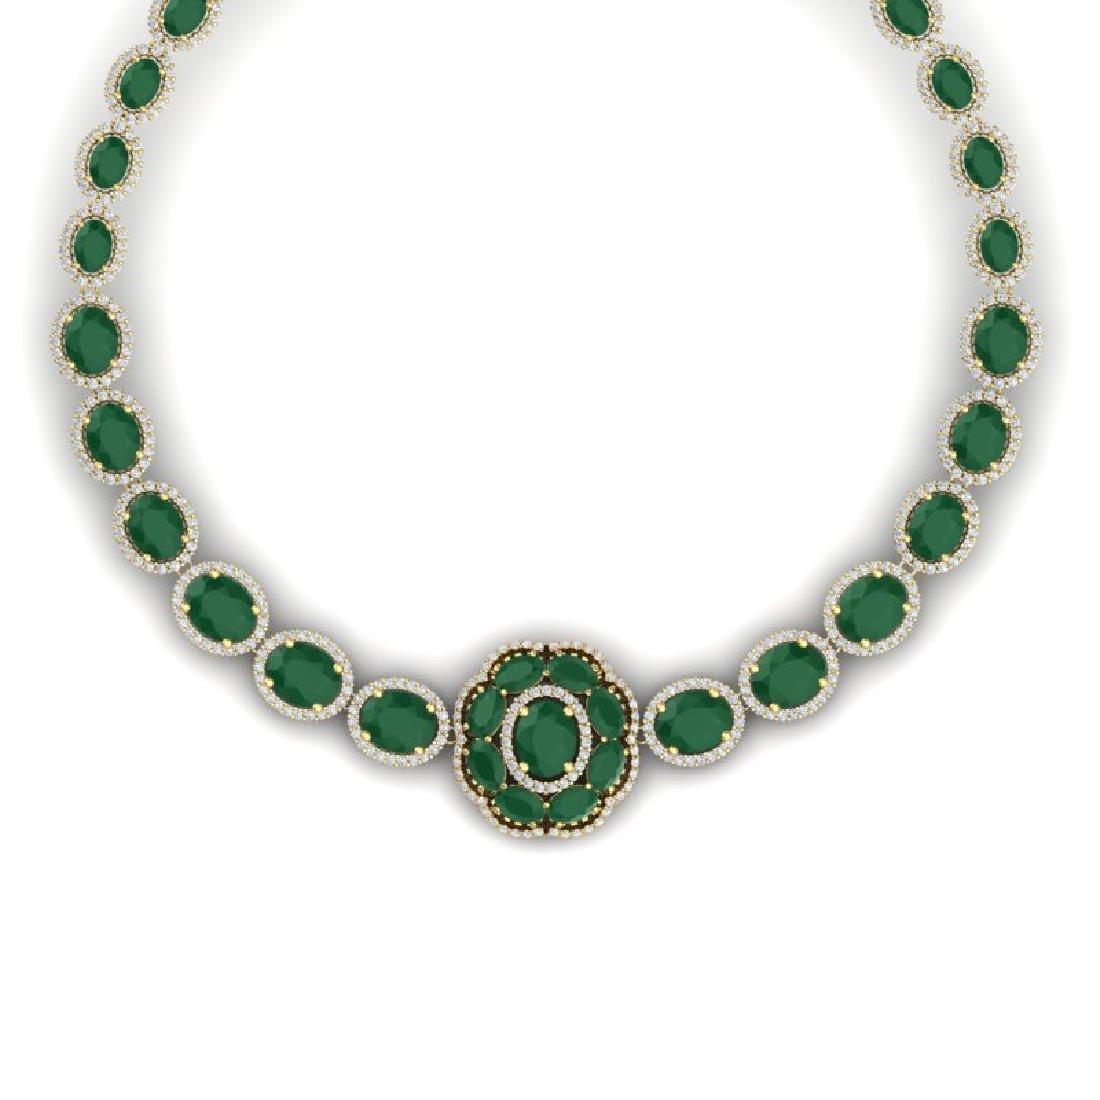 58.33 CTW Royalty Emerald & VS Diamond Necklace 18K - 2